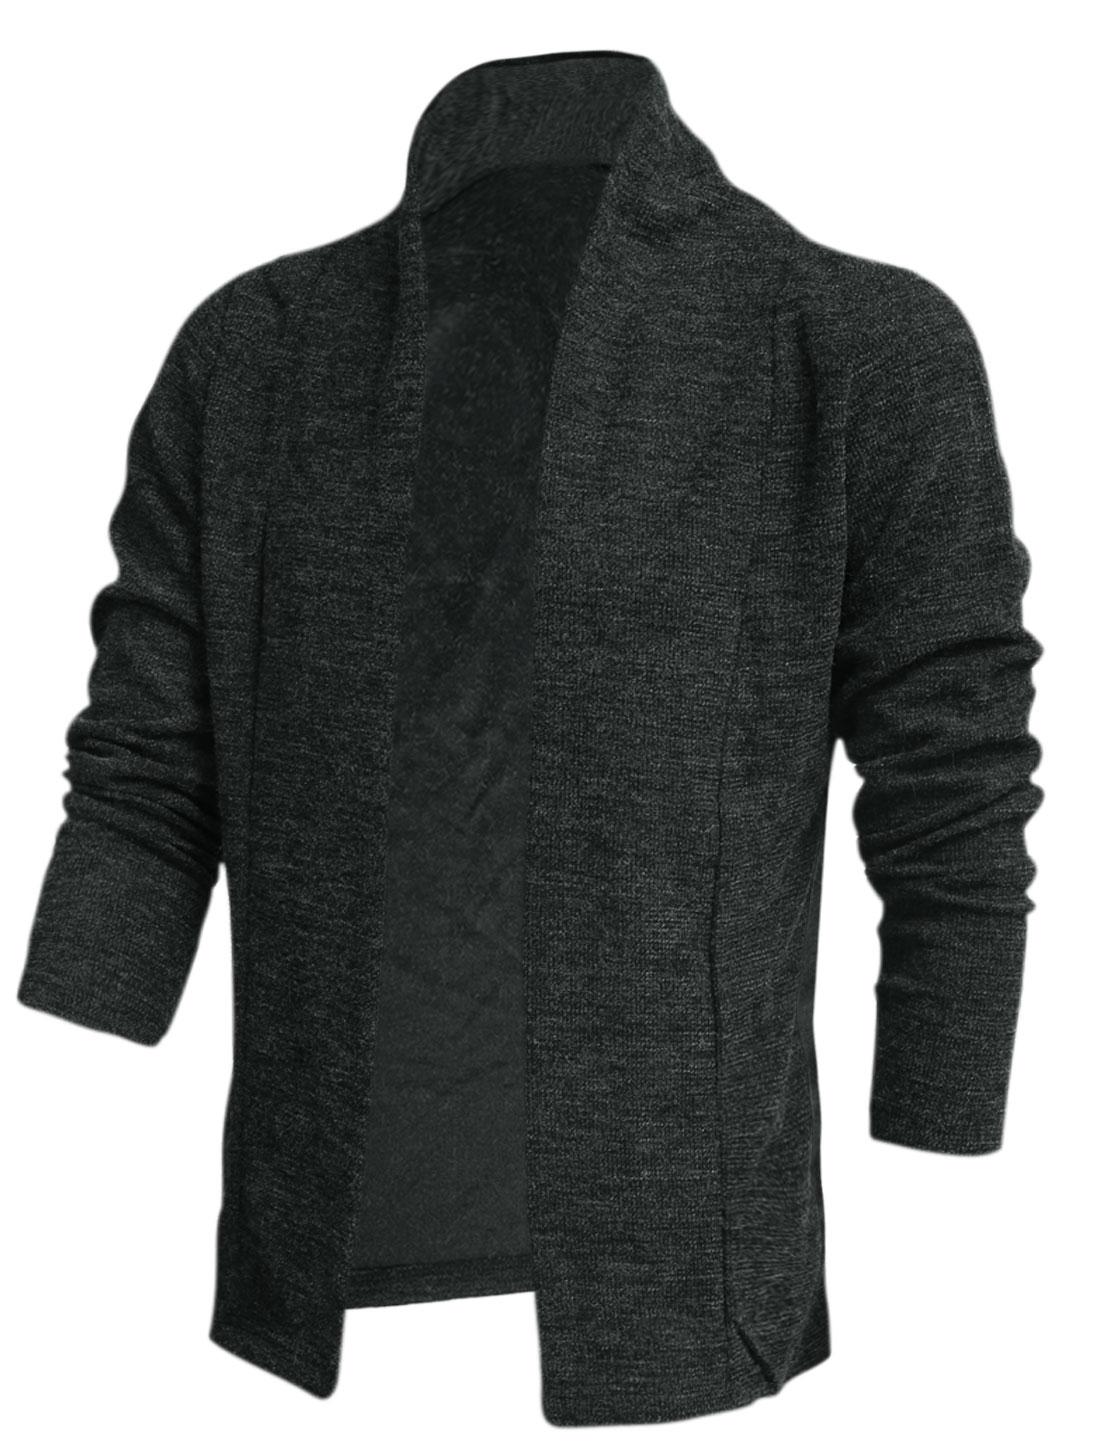 New Style Soft Shawl Collar Design Knit Cardigan for Men Dark Gray M